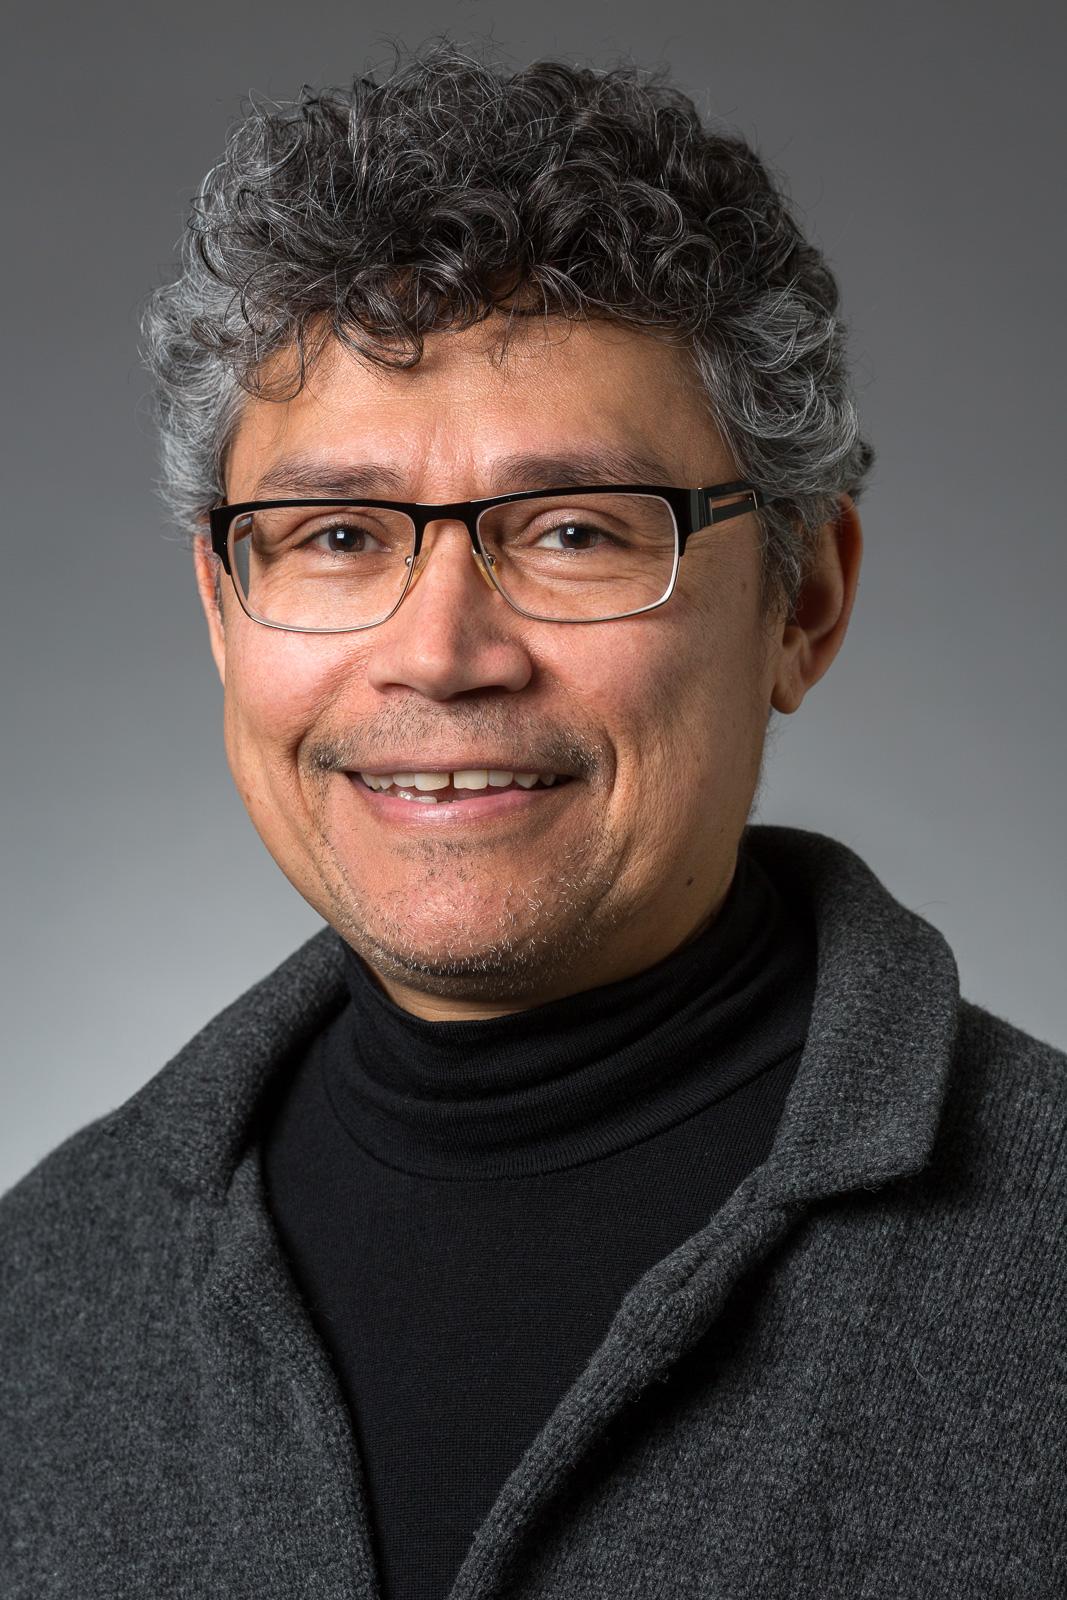 Vladimir Douglas Pacheco Cueva